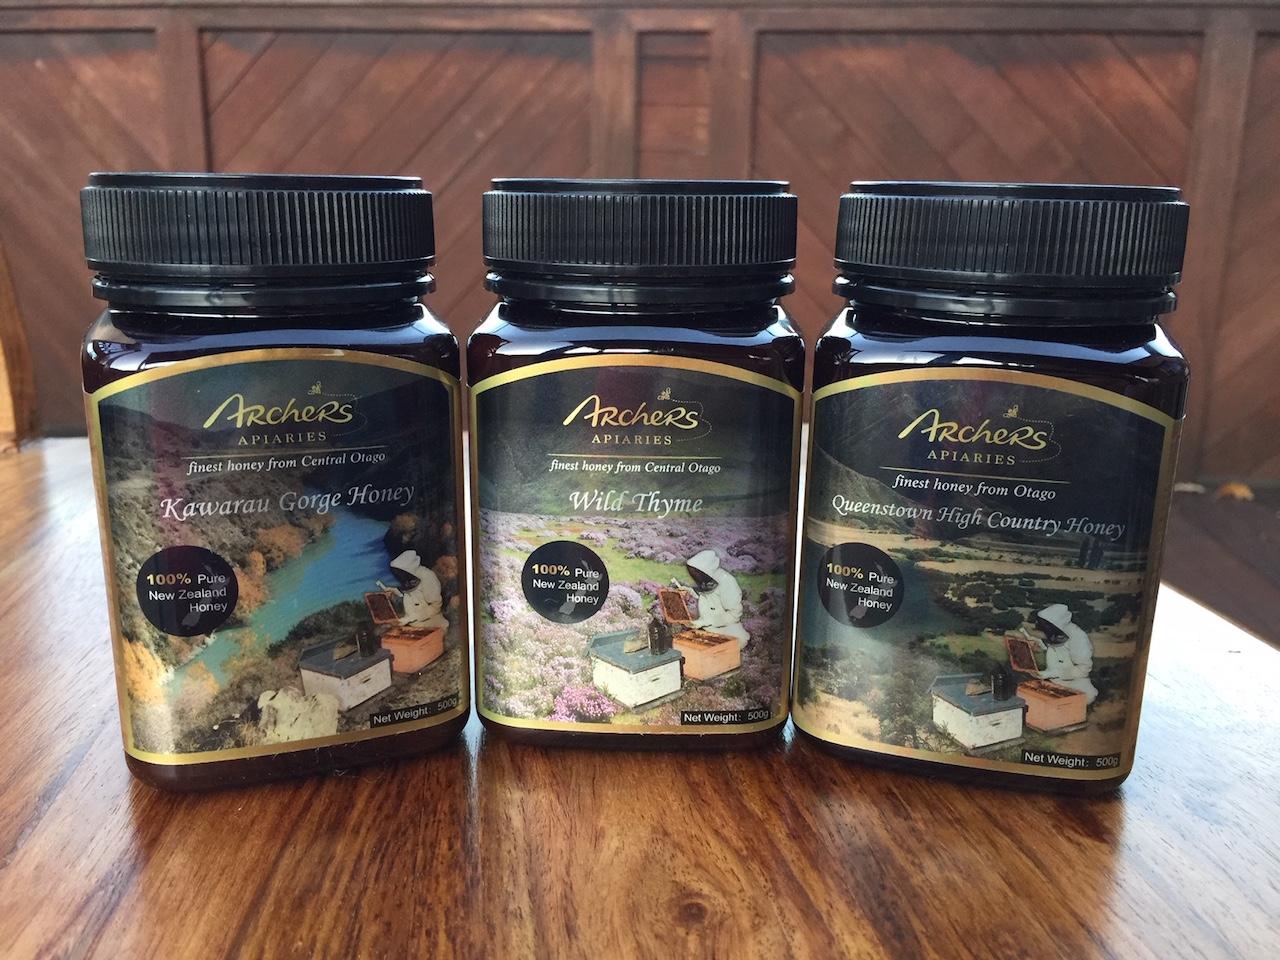 Special - 3 x 500g Otago Honey(3 different types)